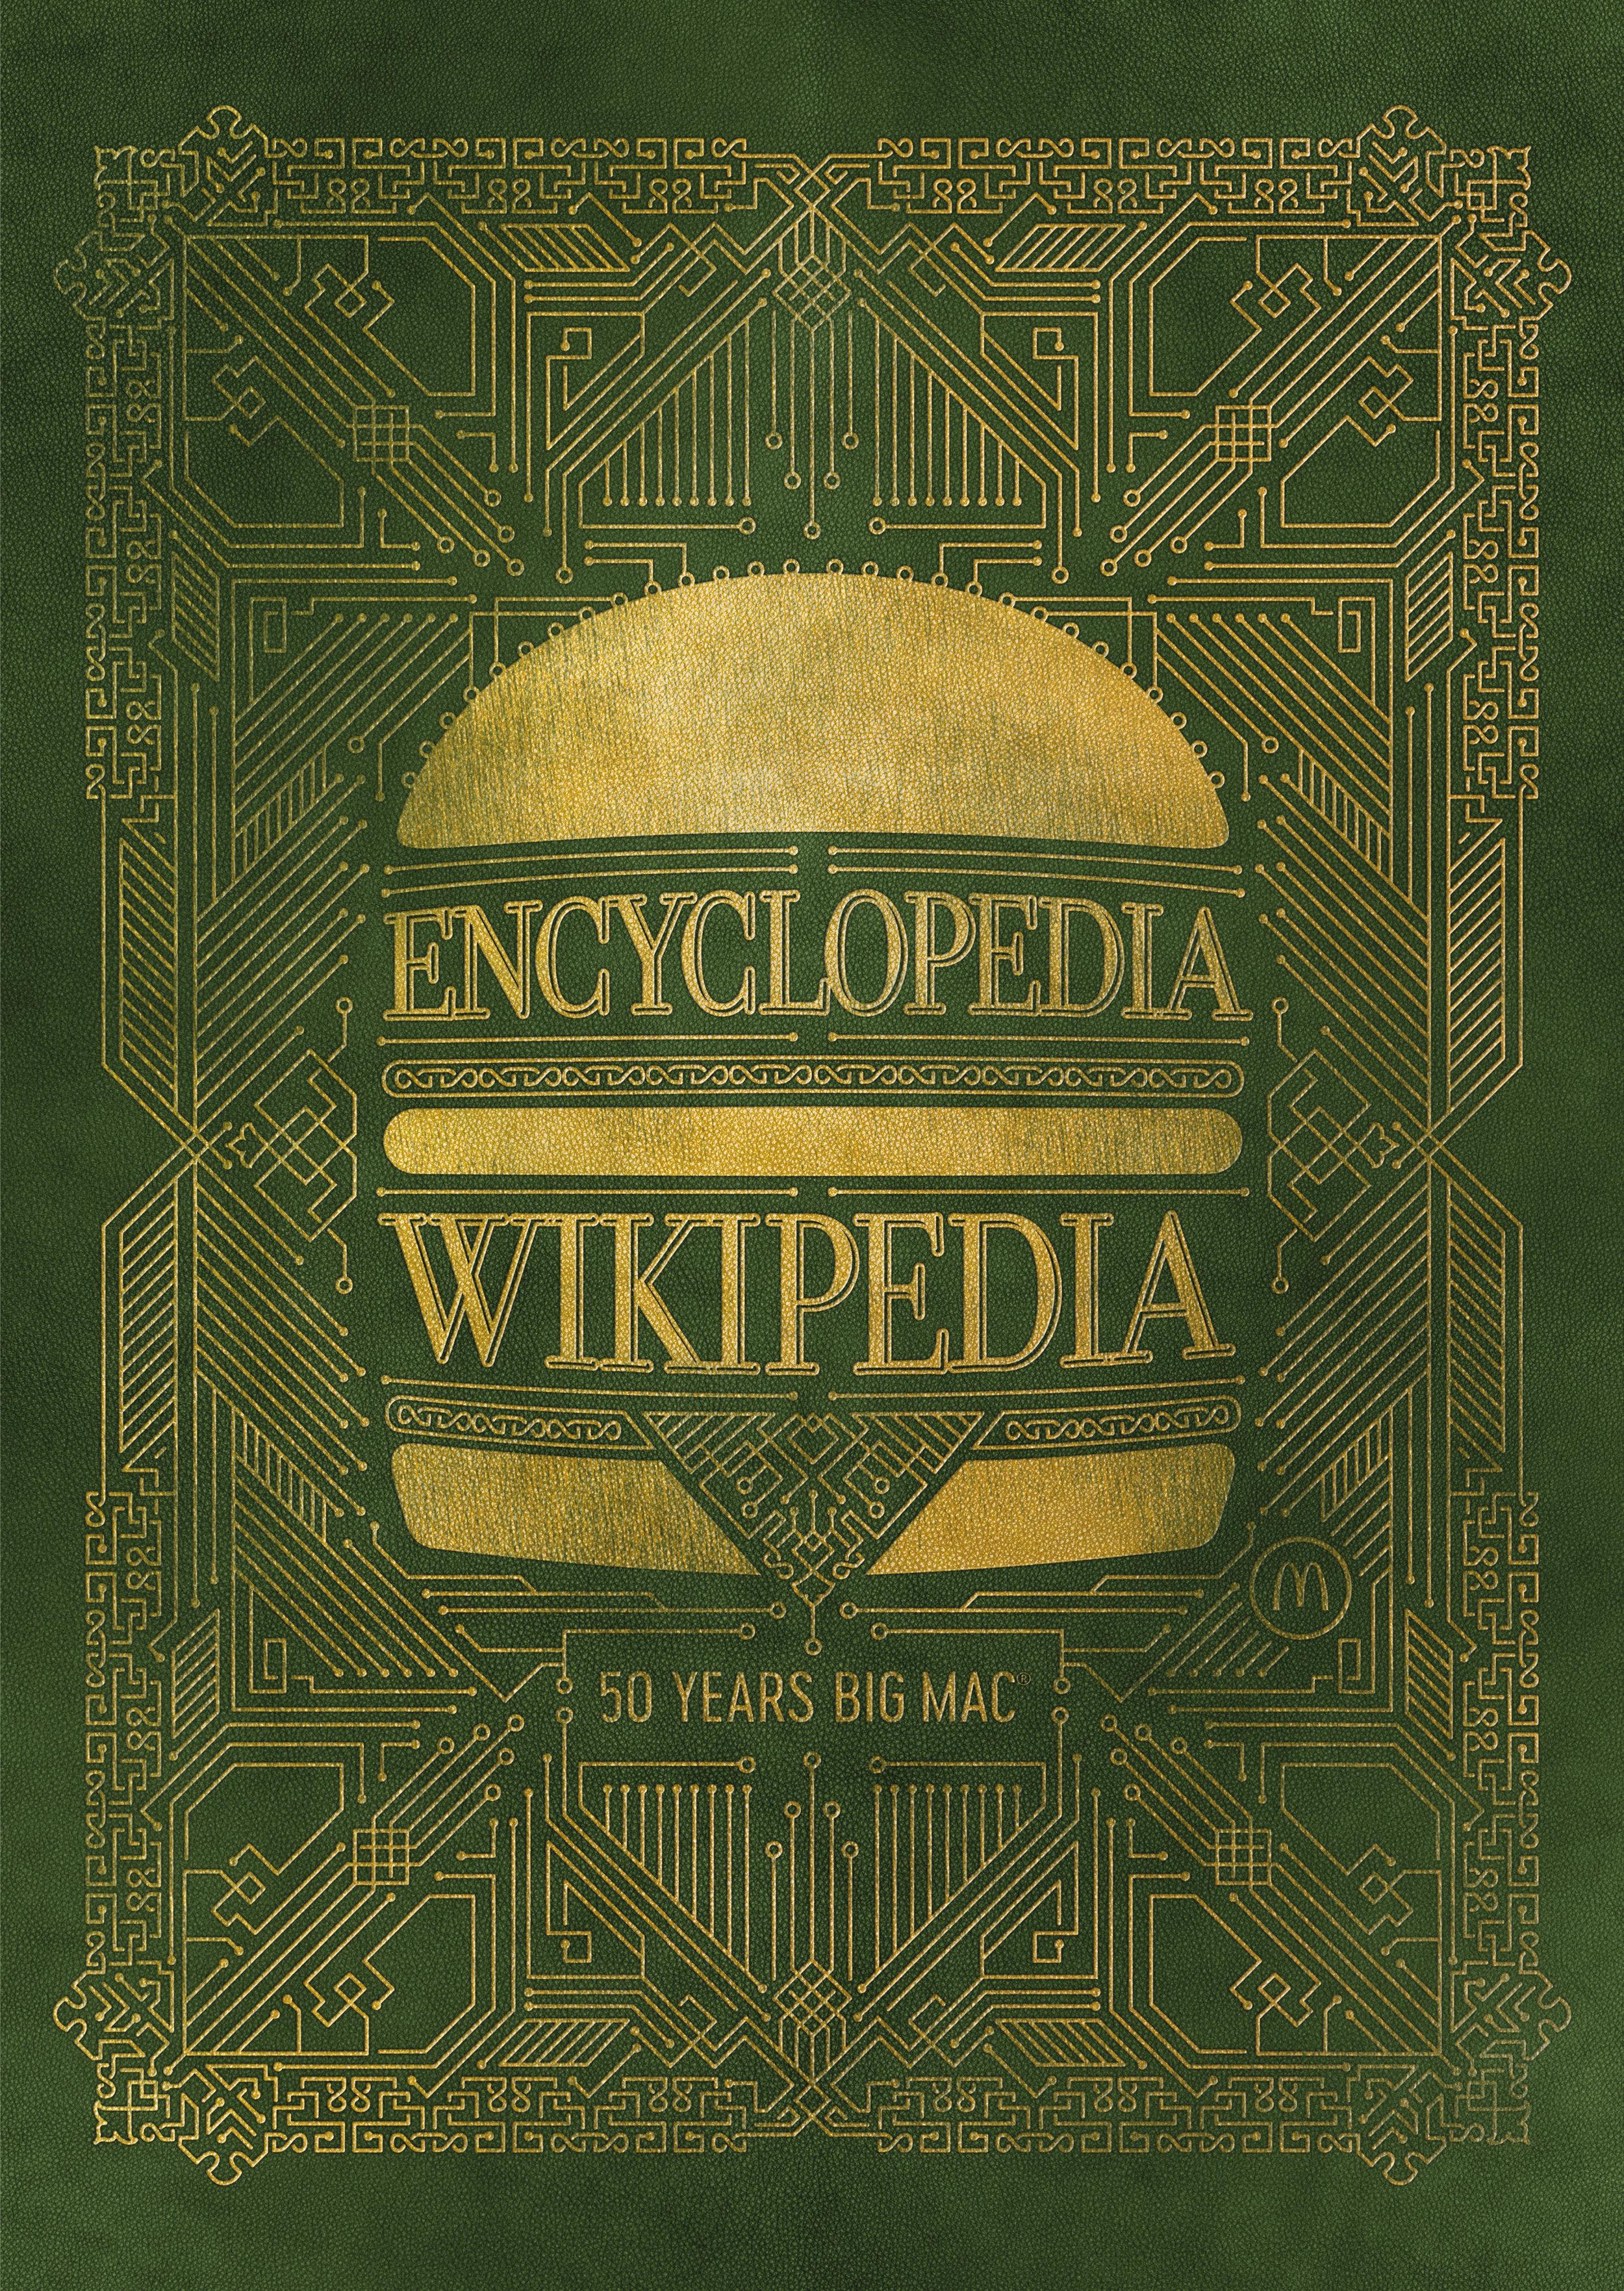 44_Encyclopedia:Wikipedia.jpg